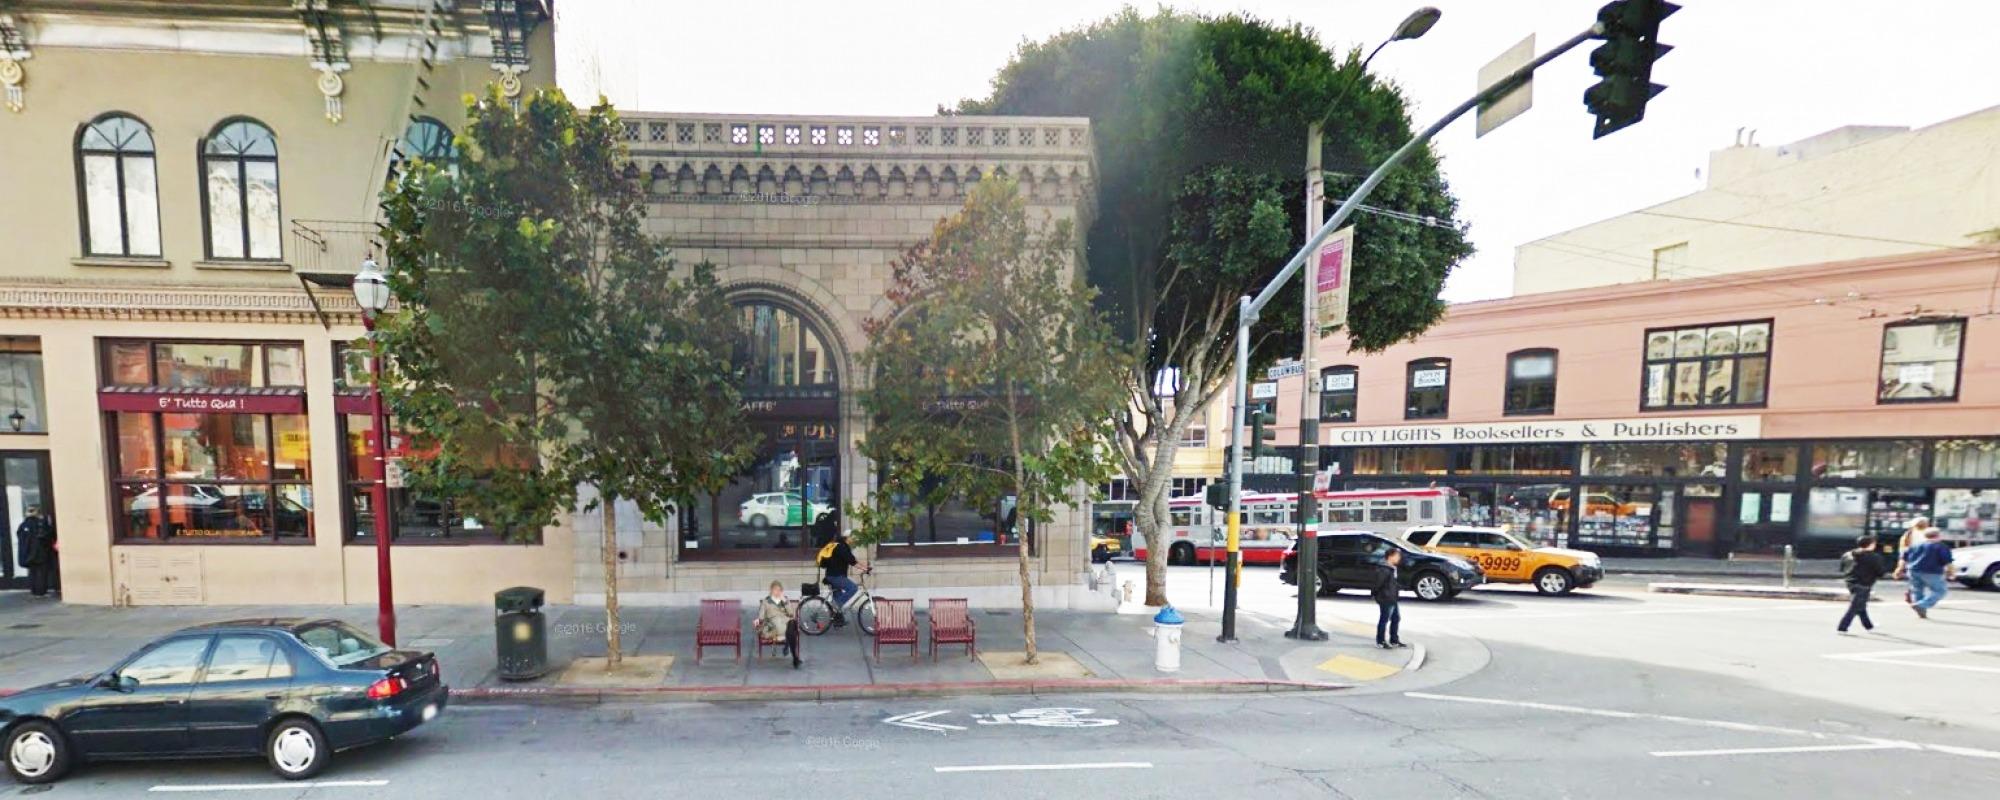 Broadway Streetscape Improvement Project Phase II